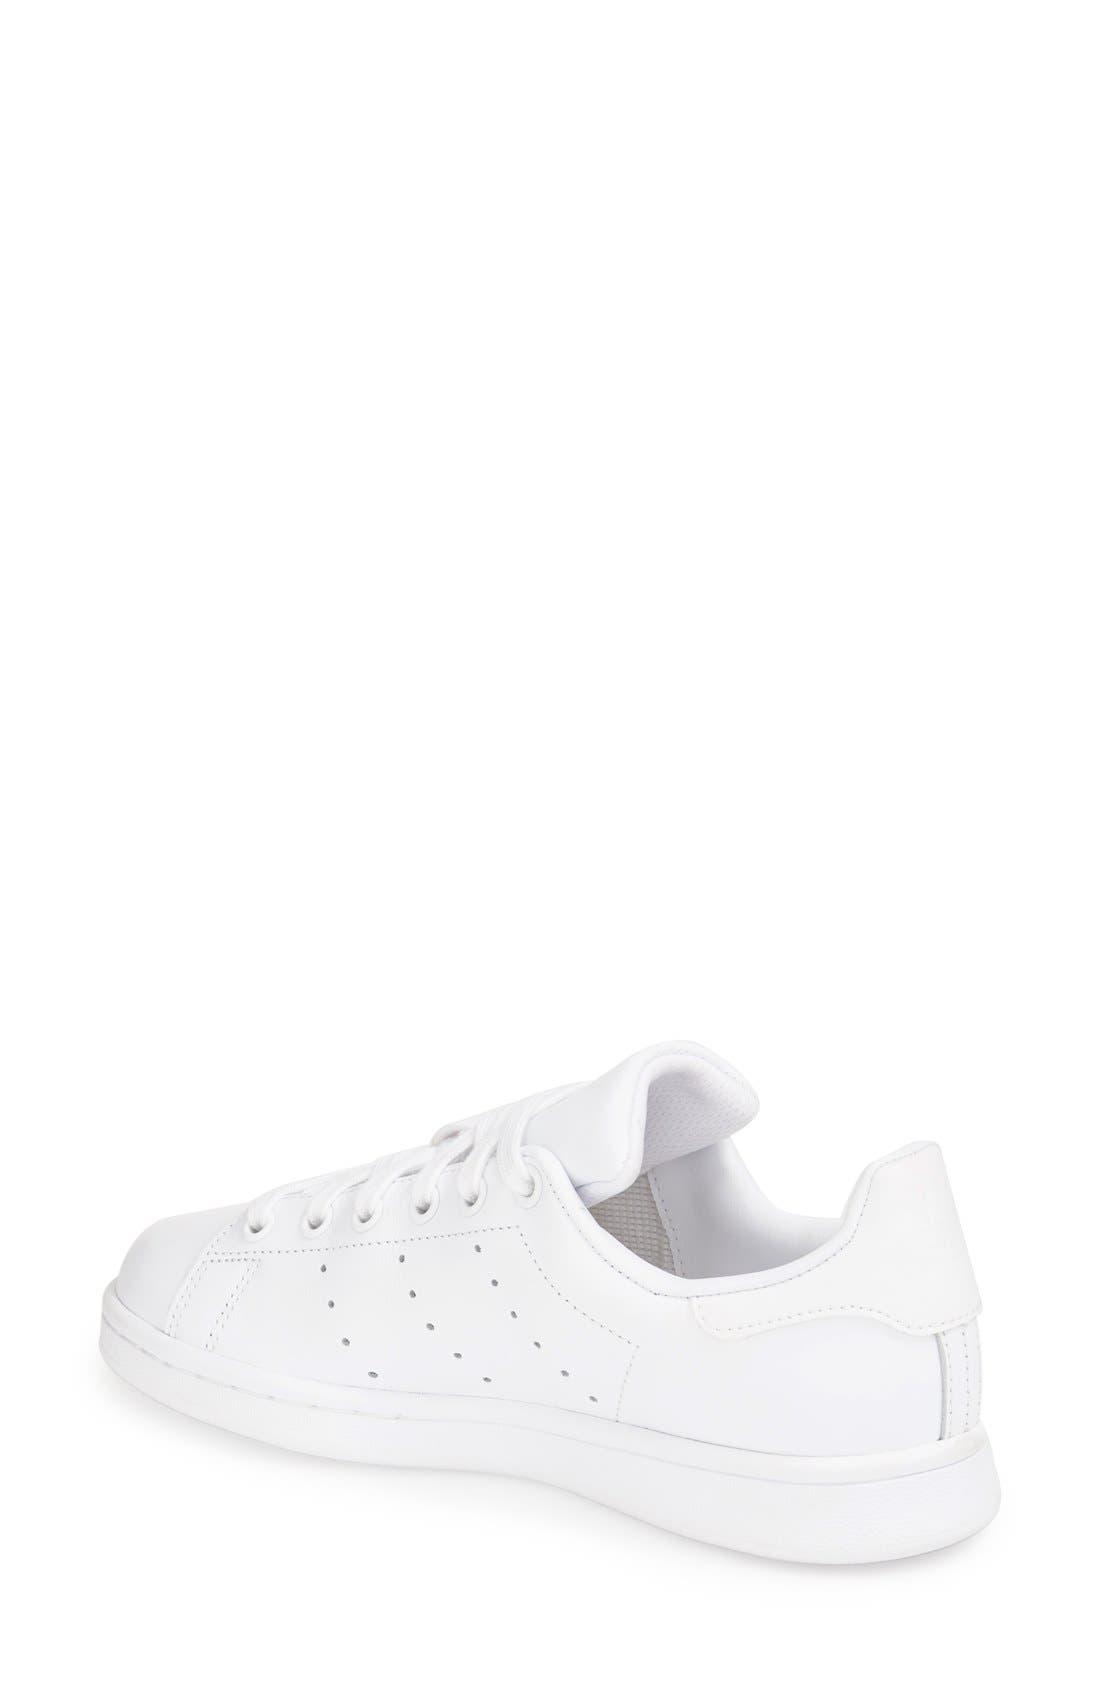 'Stan Smith' Sneaker,                             Alternate thumbnail 41, color,